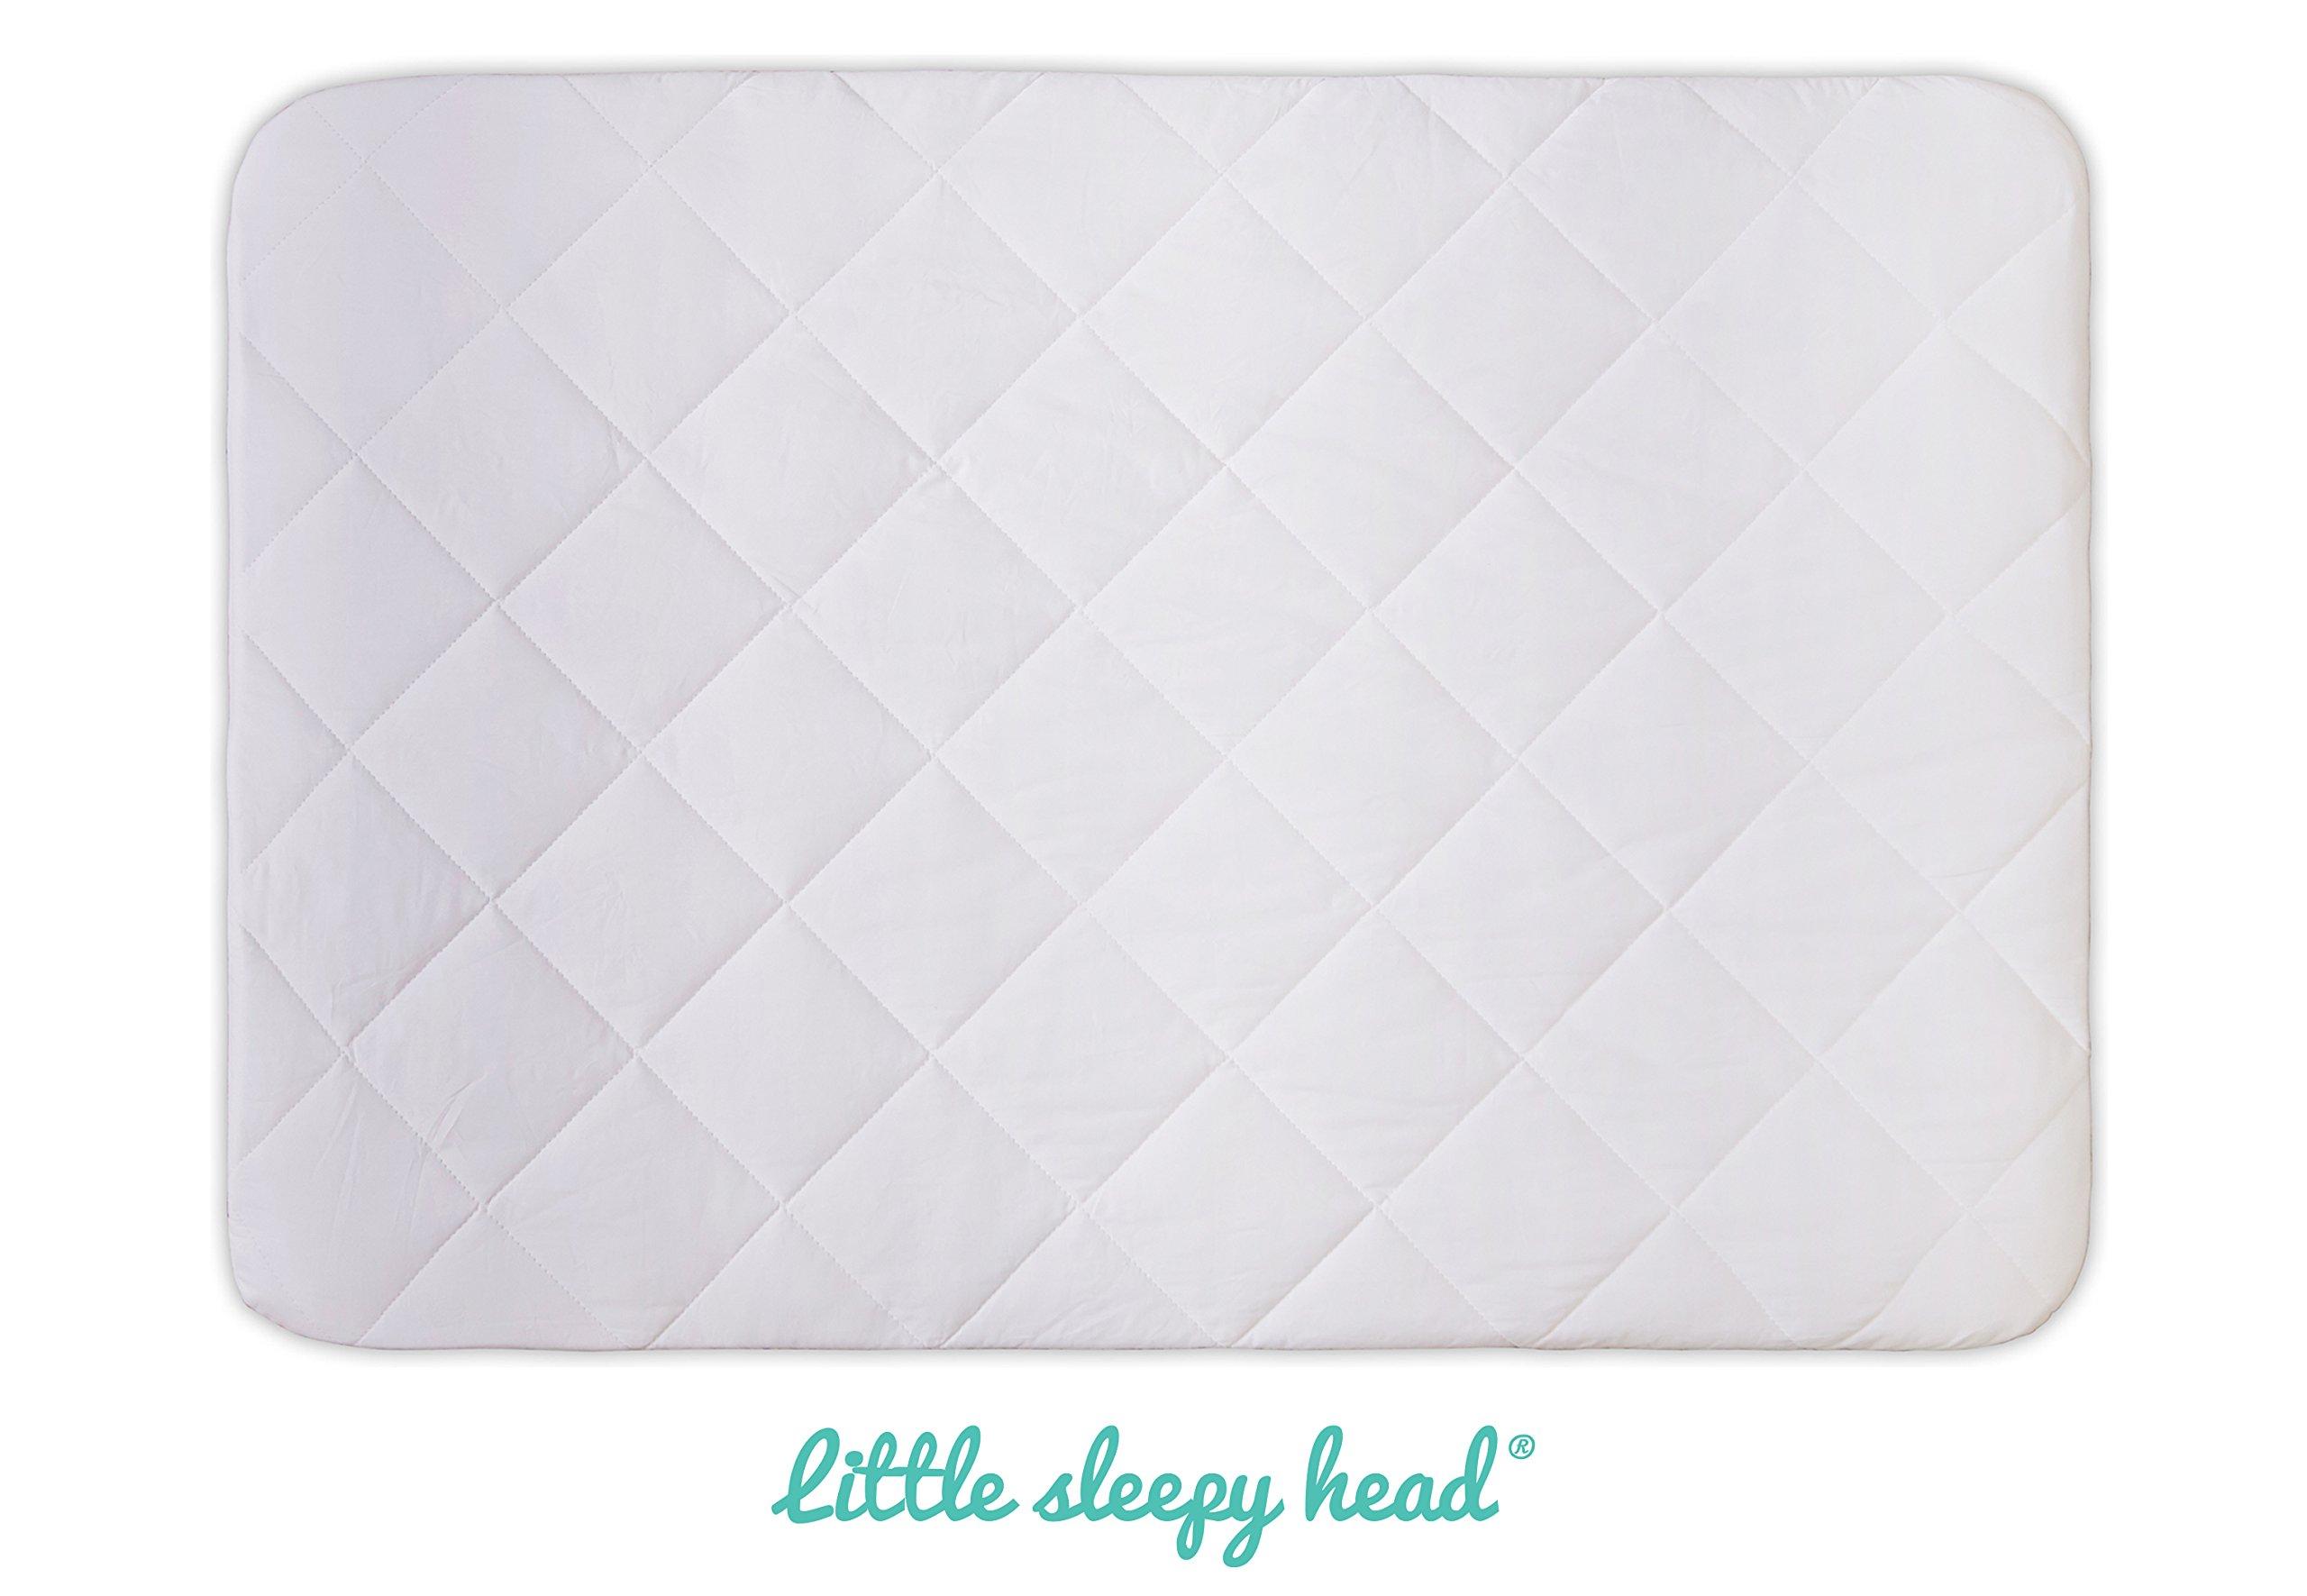 Soft, Waterproof Portable Crib Mattress Protector/Pad for Pack n Play & Play Yards